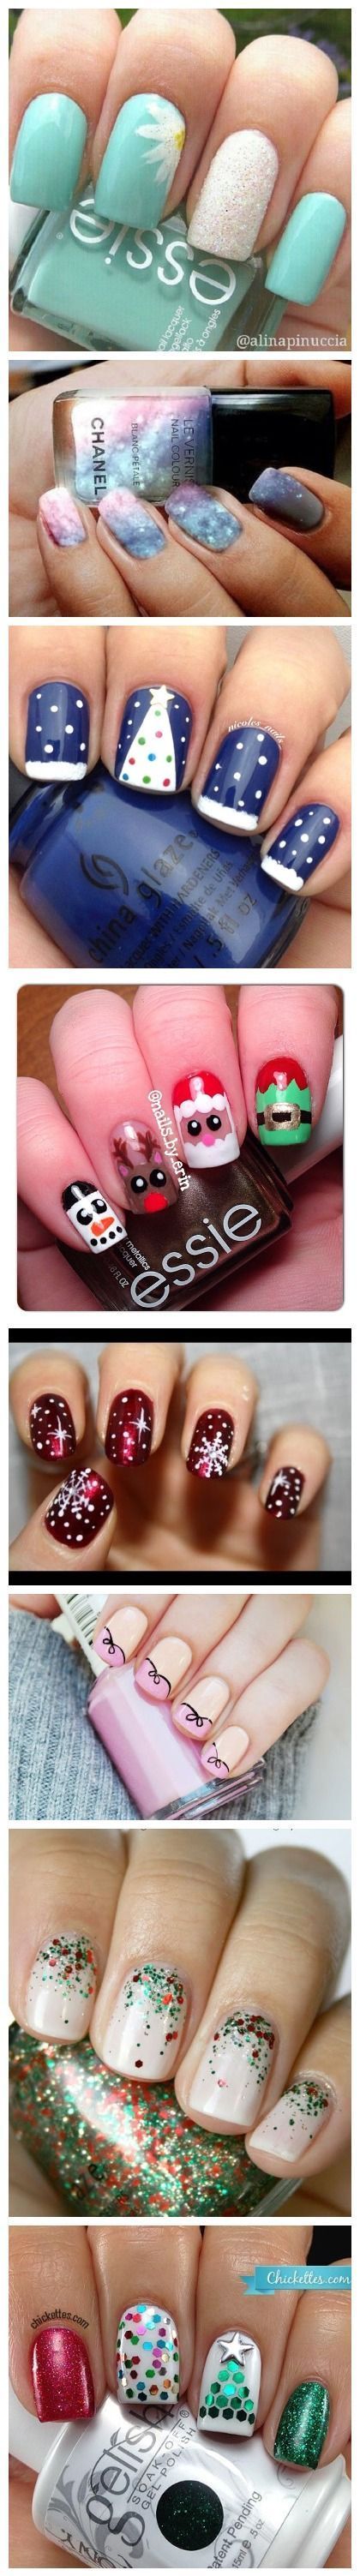 My nail design compilation nails in pinterest nail art